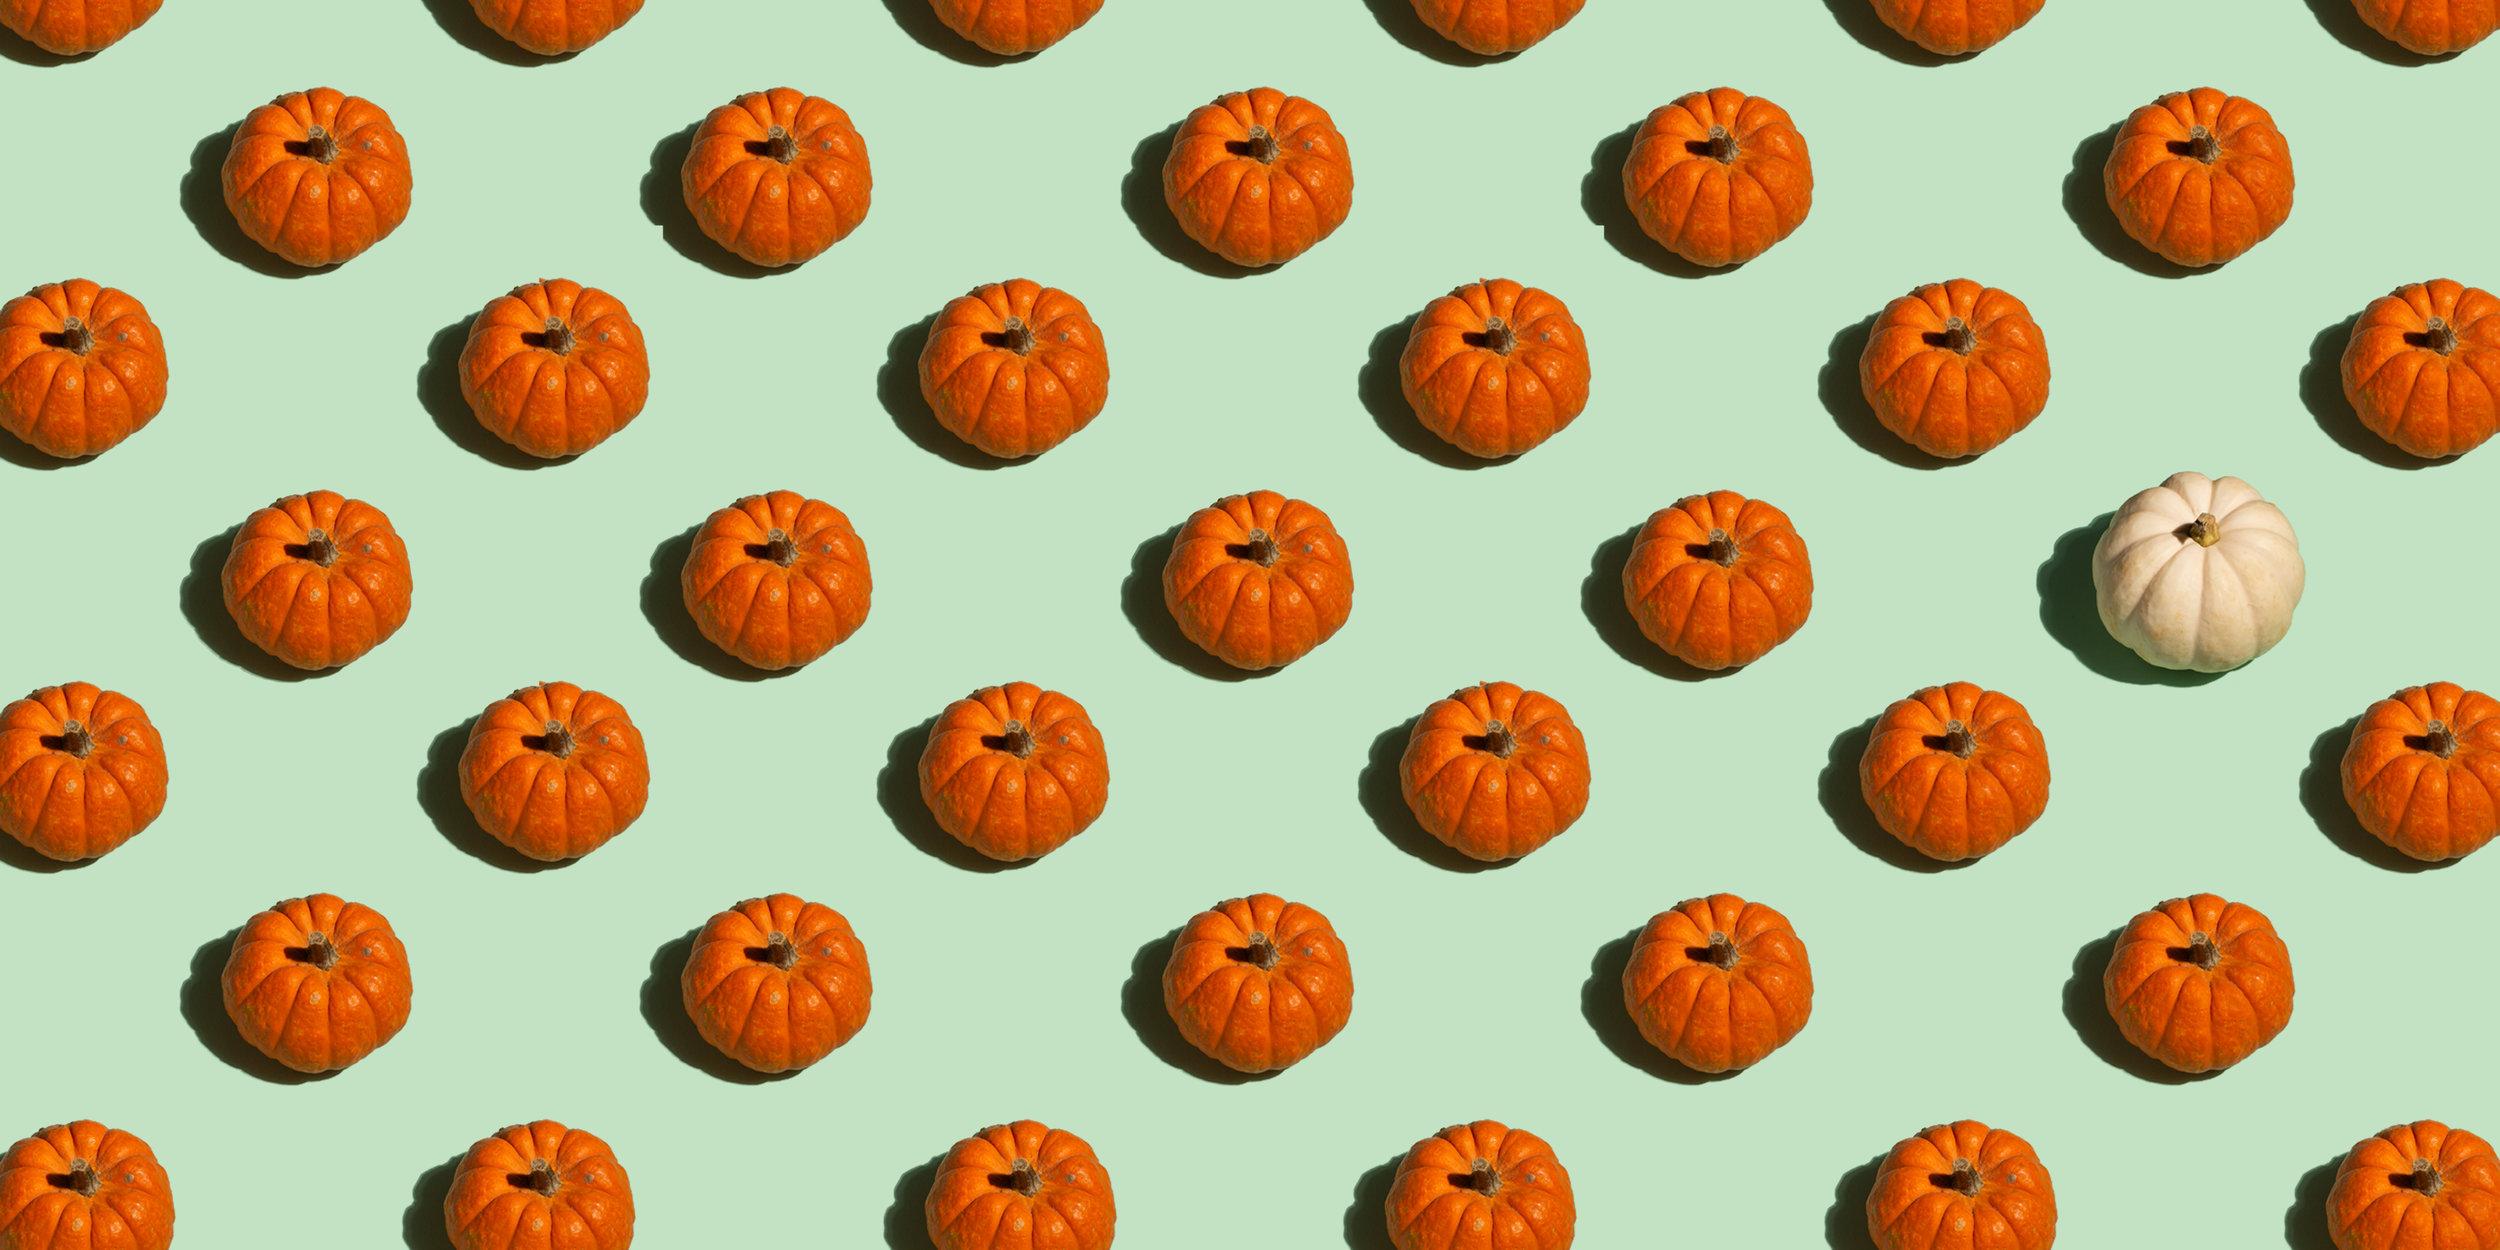 Pumpkin Pattern.jpg